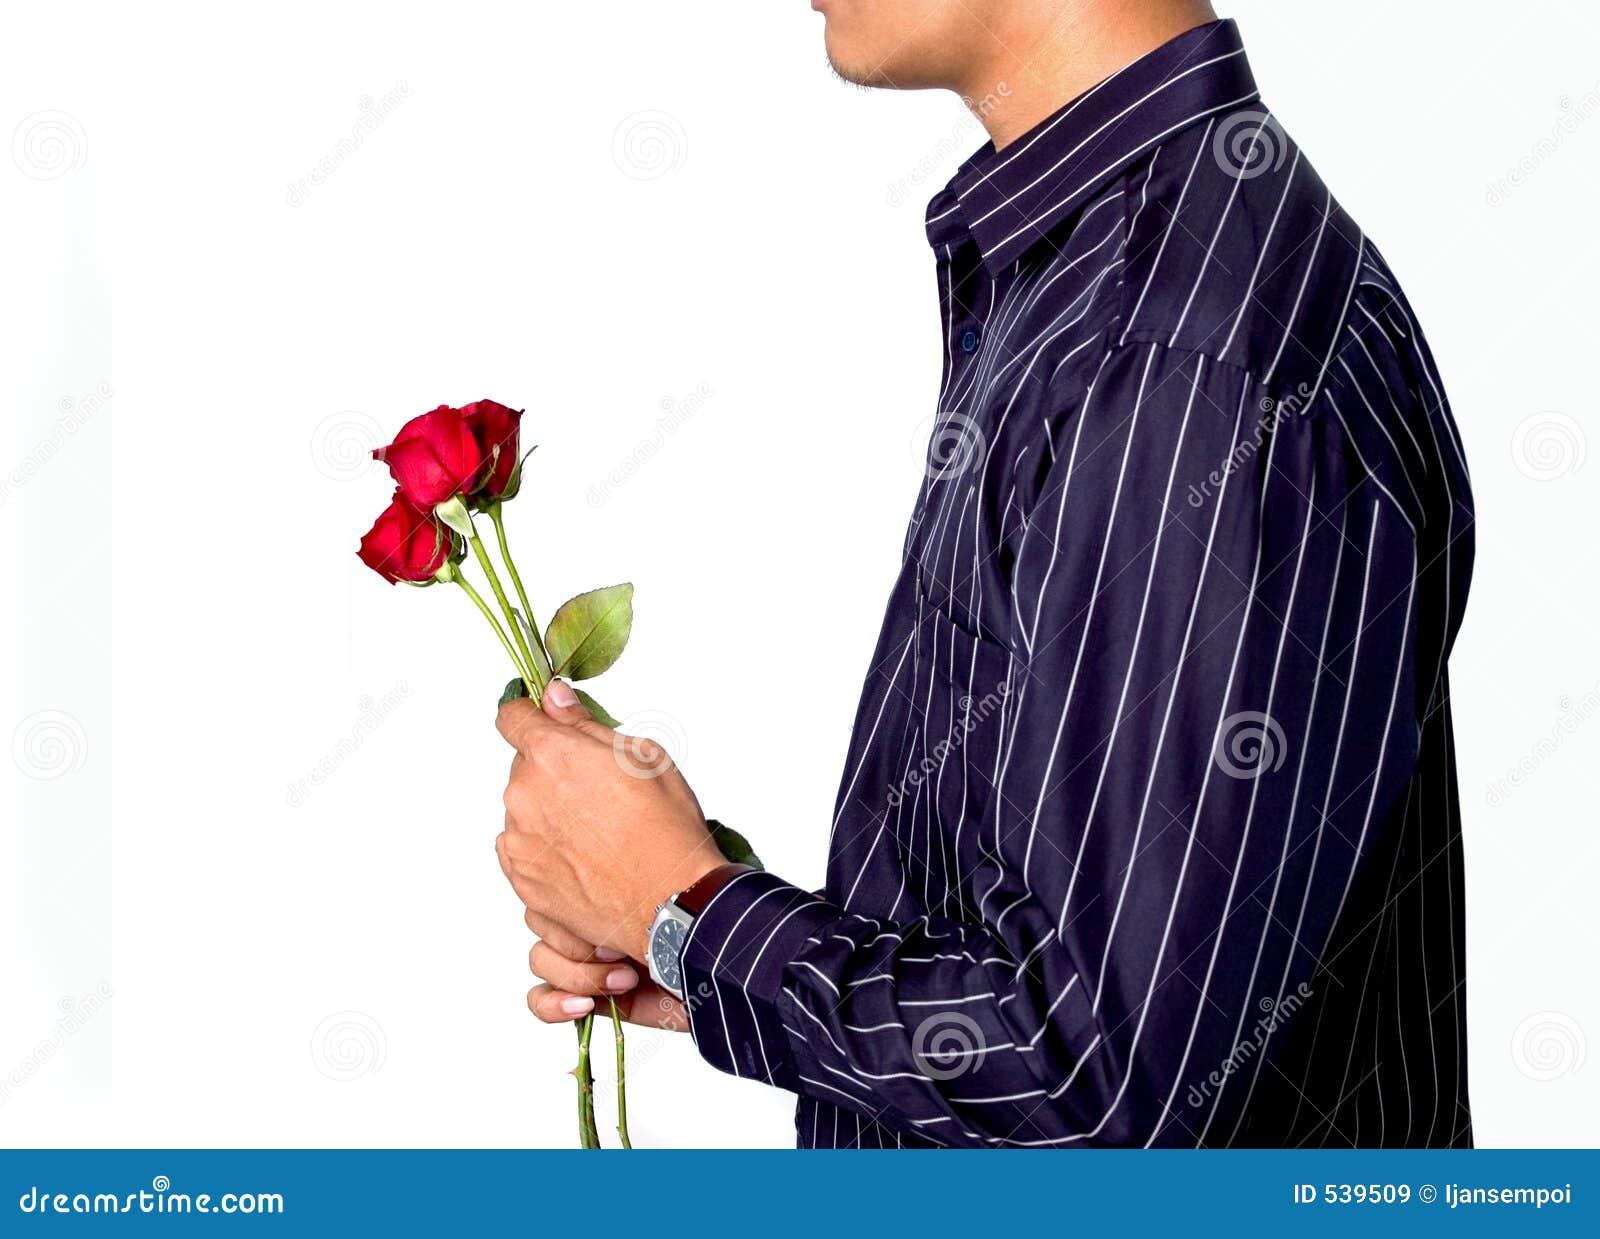 Download 藏品人红色玫瑰 库存图片. 图片 包括有 部分, 约会, 礼品, 罗密欧, 灵魂, 华伦泰, 特殊, 恋人, 锋利 - 539509